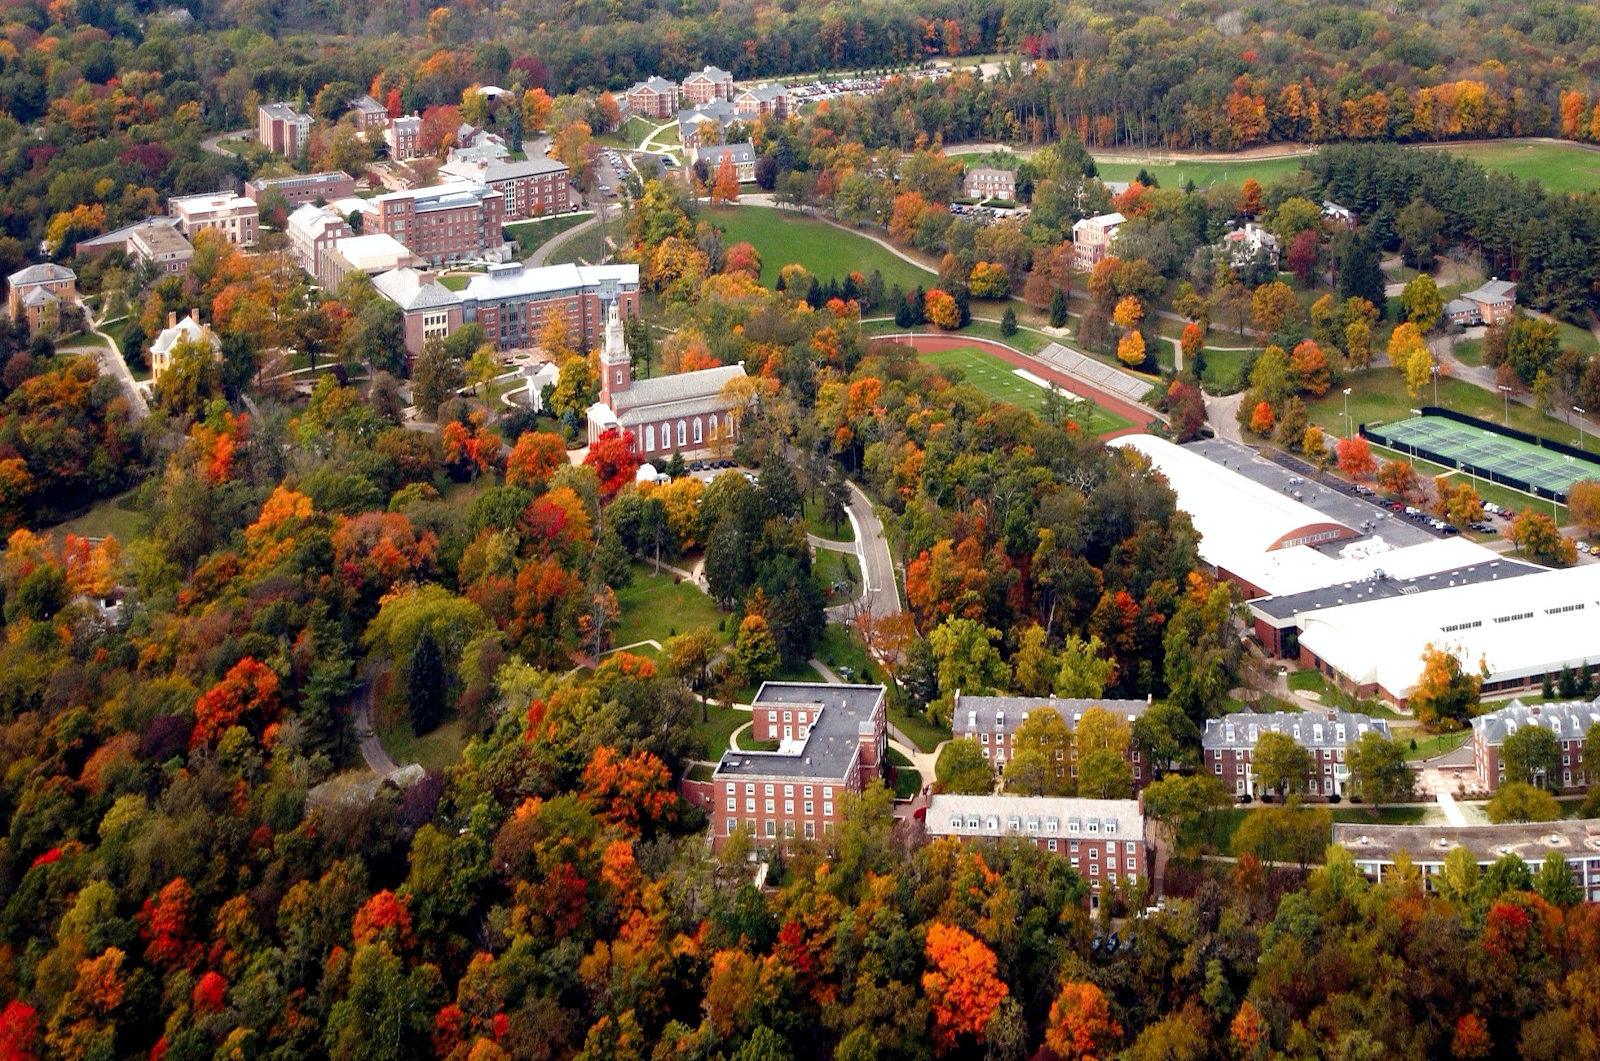 aerial view of Denison University